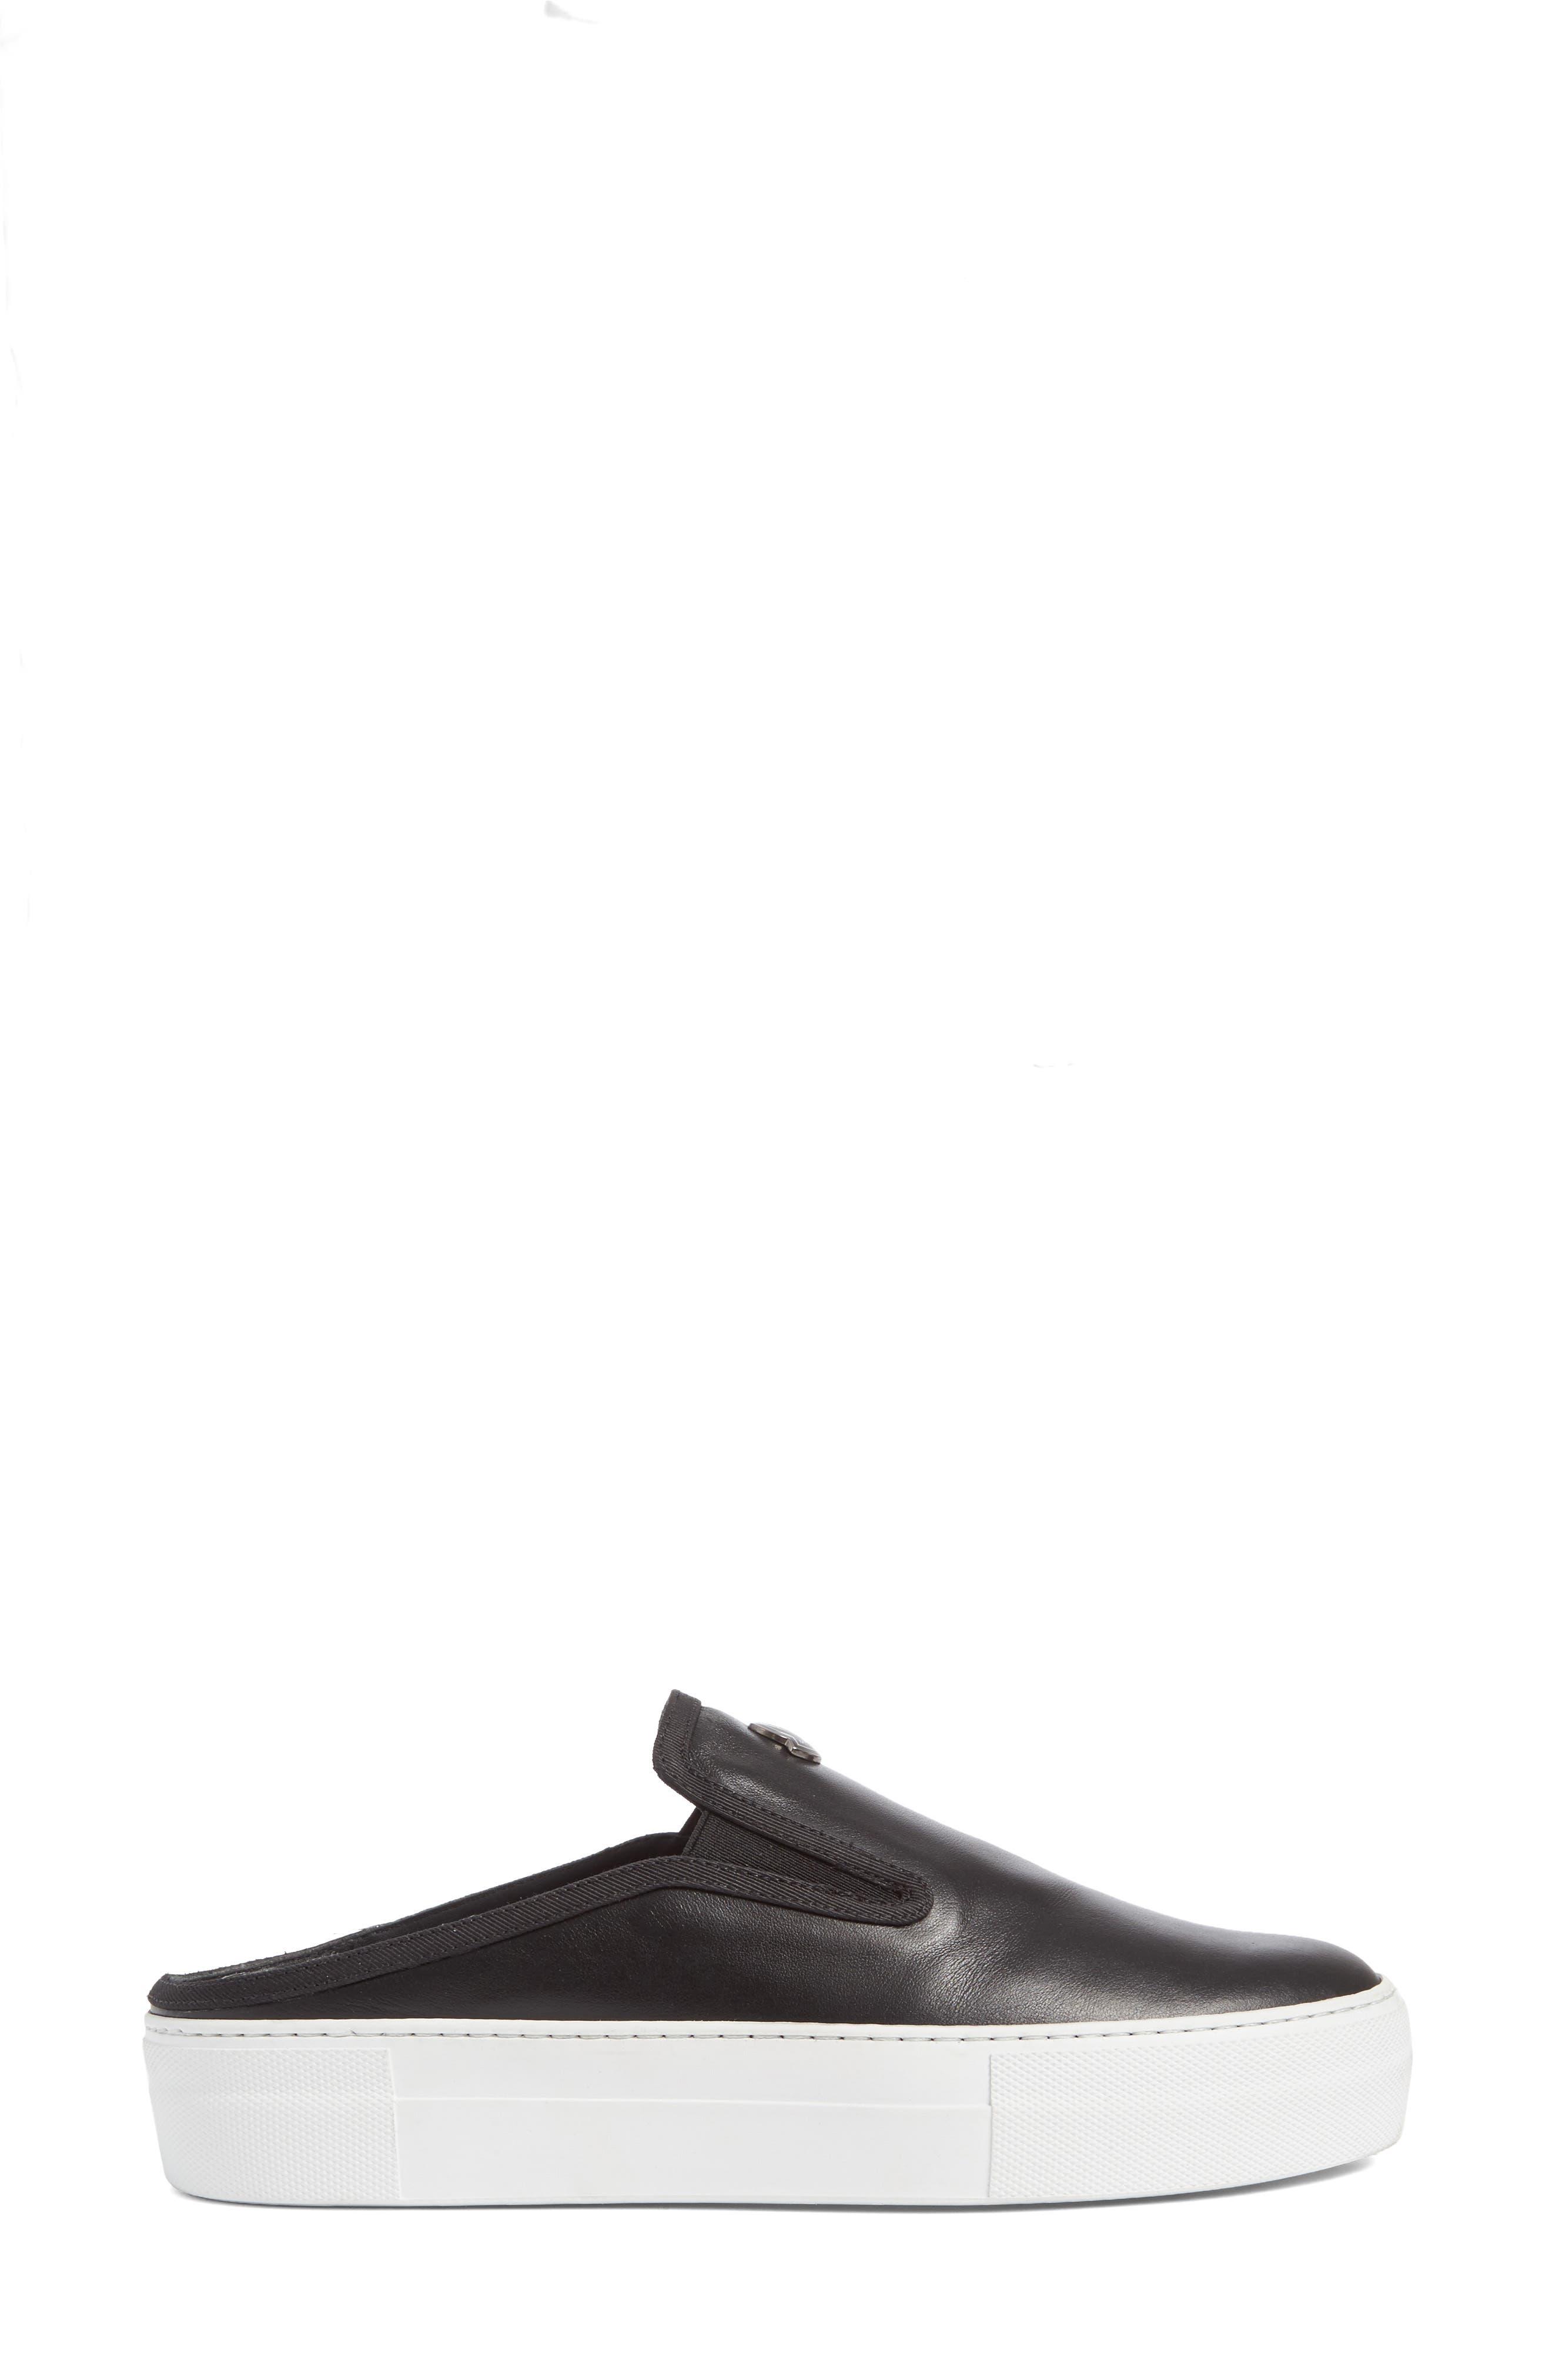 Tiphanie Backless Platform Sneaker,                             Alternate thumbnail 4, color,                             Black Leather